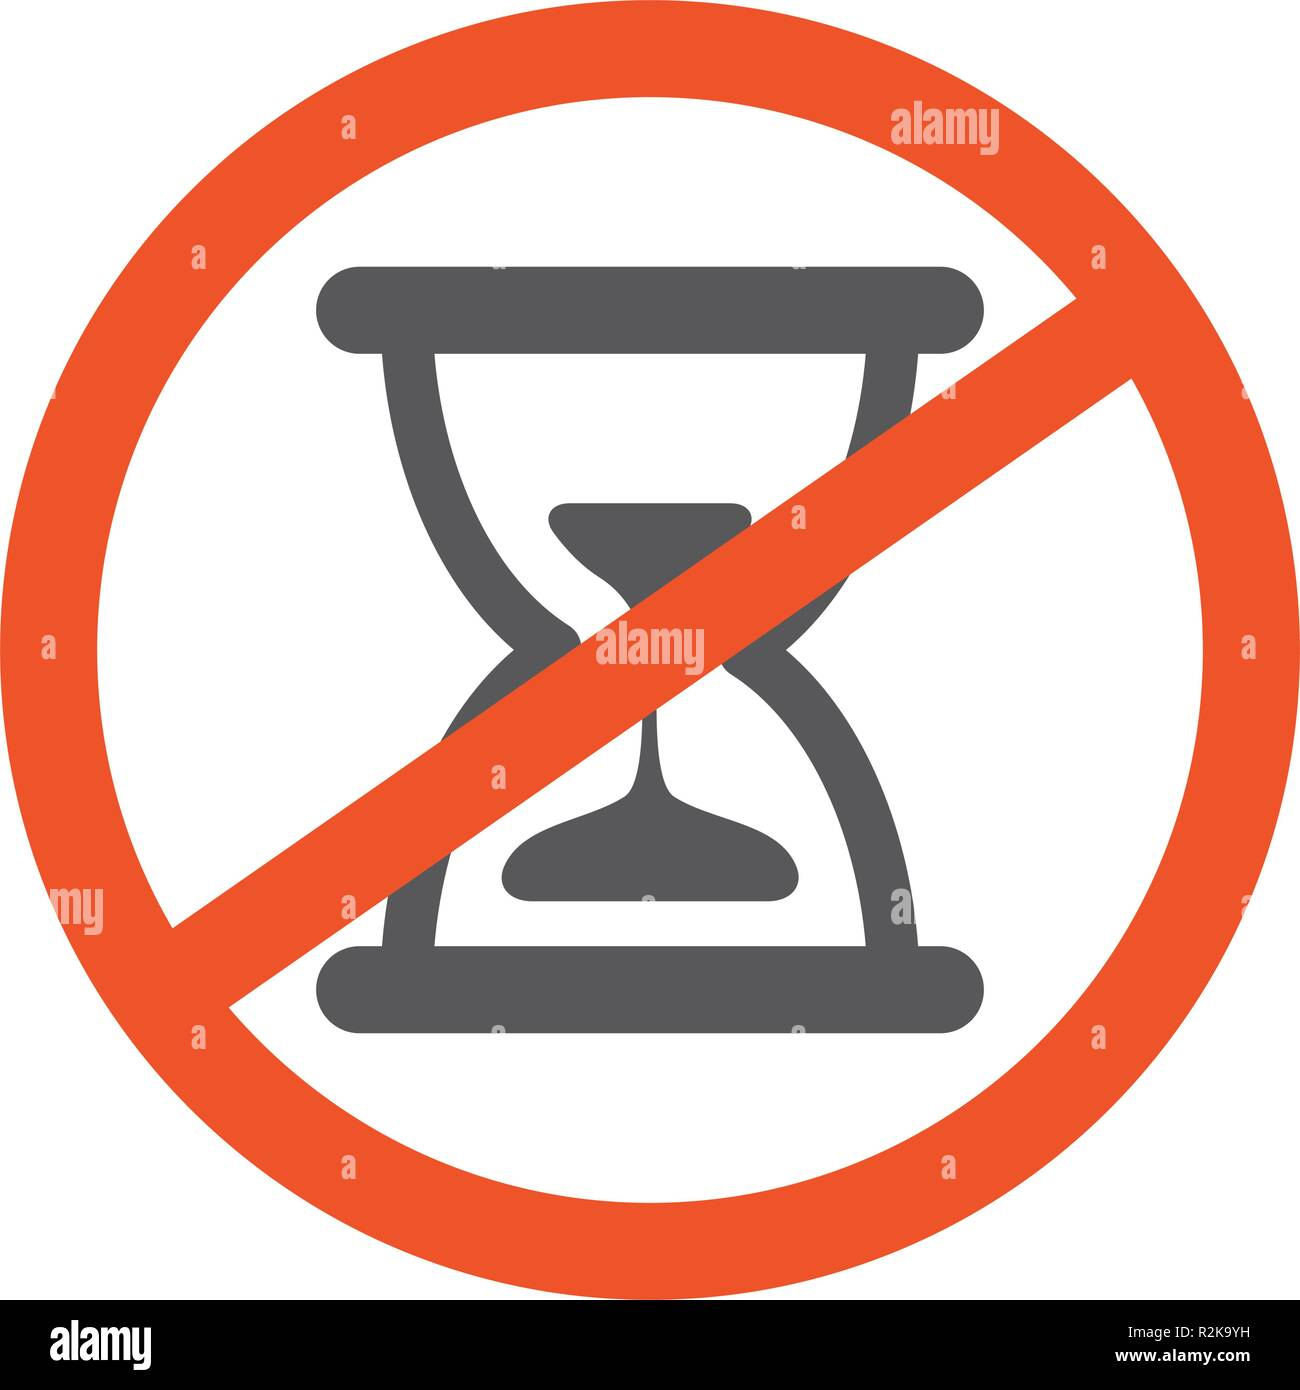 No Hourglass symbol design illustration  Forbidden sign with